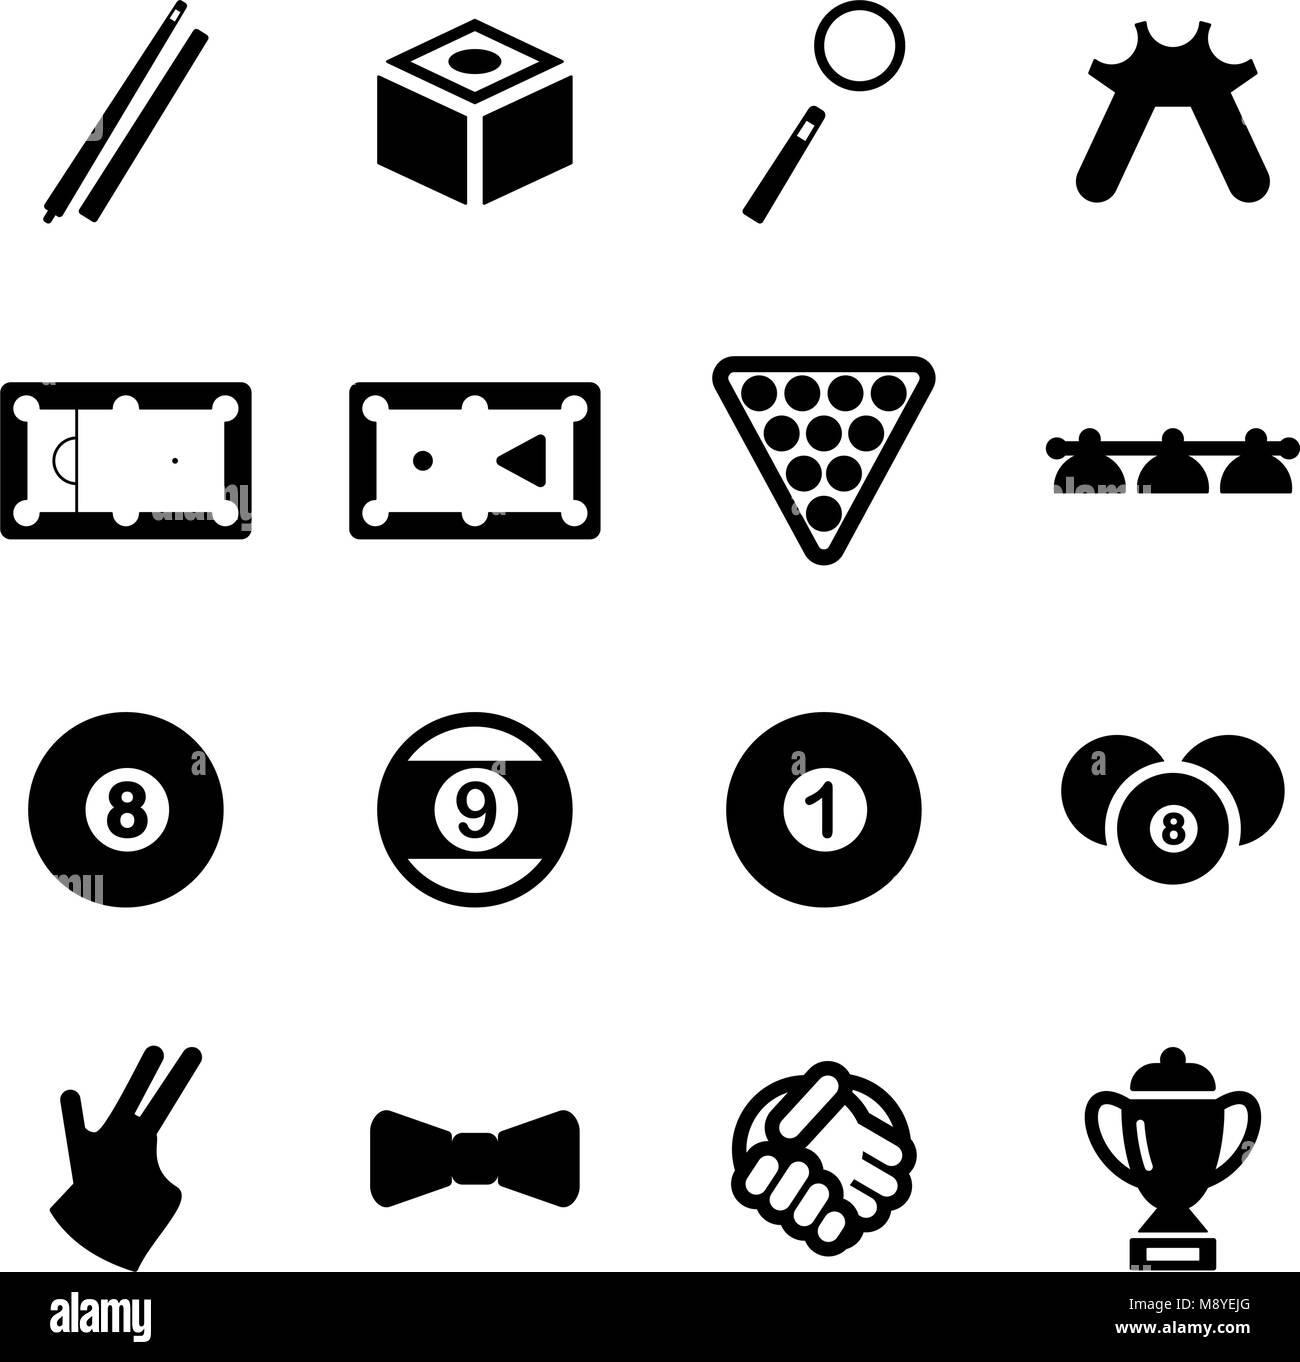 Billiards Icons - Stock Vector